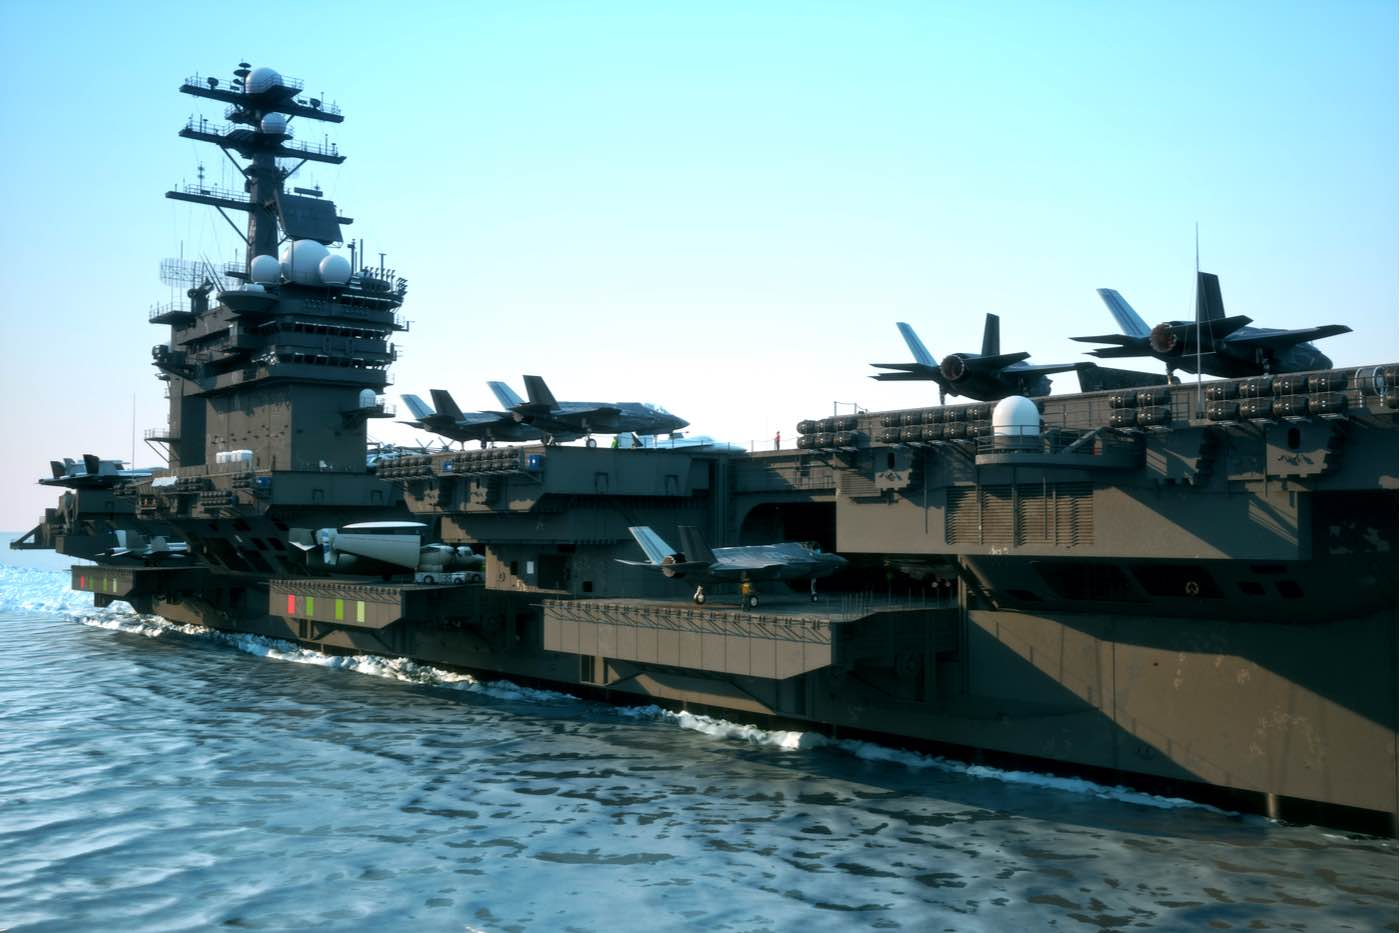 Vista angular de un portaaviones de la Armada.